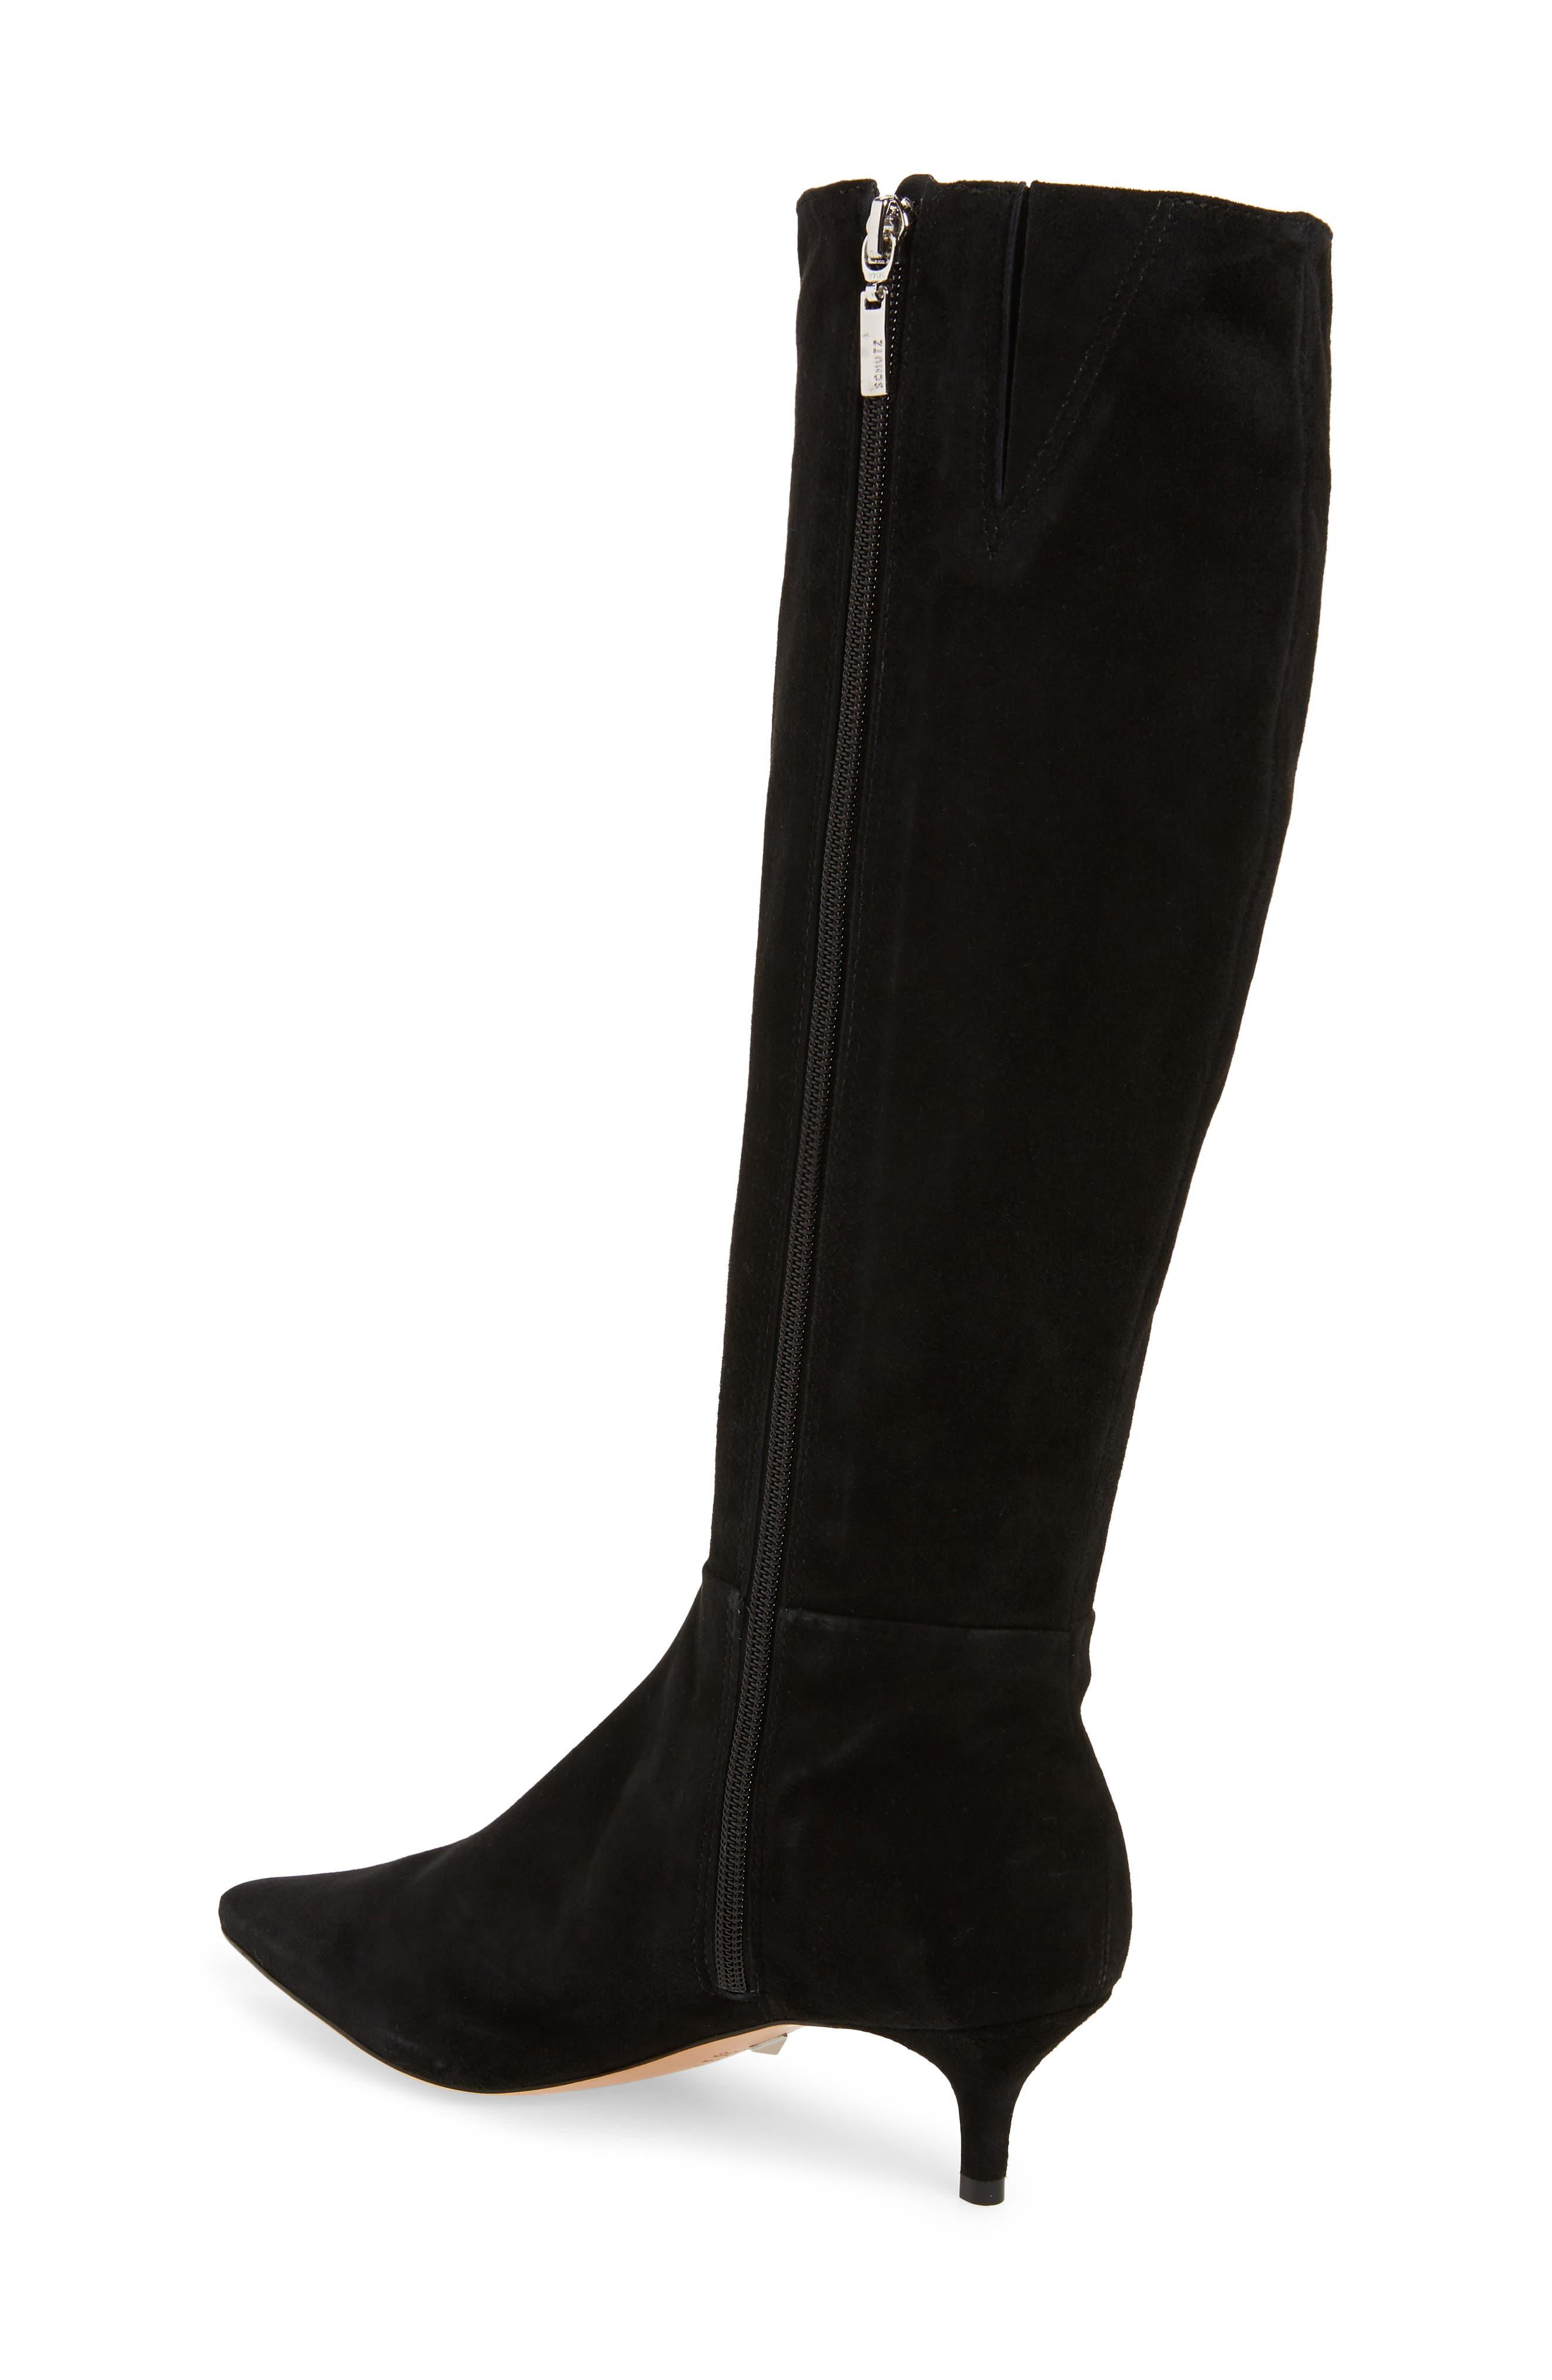 Knee High Boot,                             Alternate thumbnail 2, color,                             BLACK FABRIC